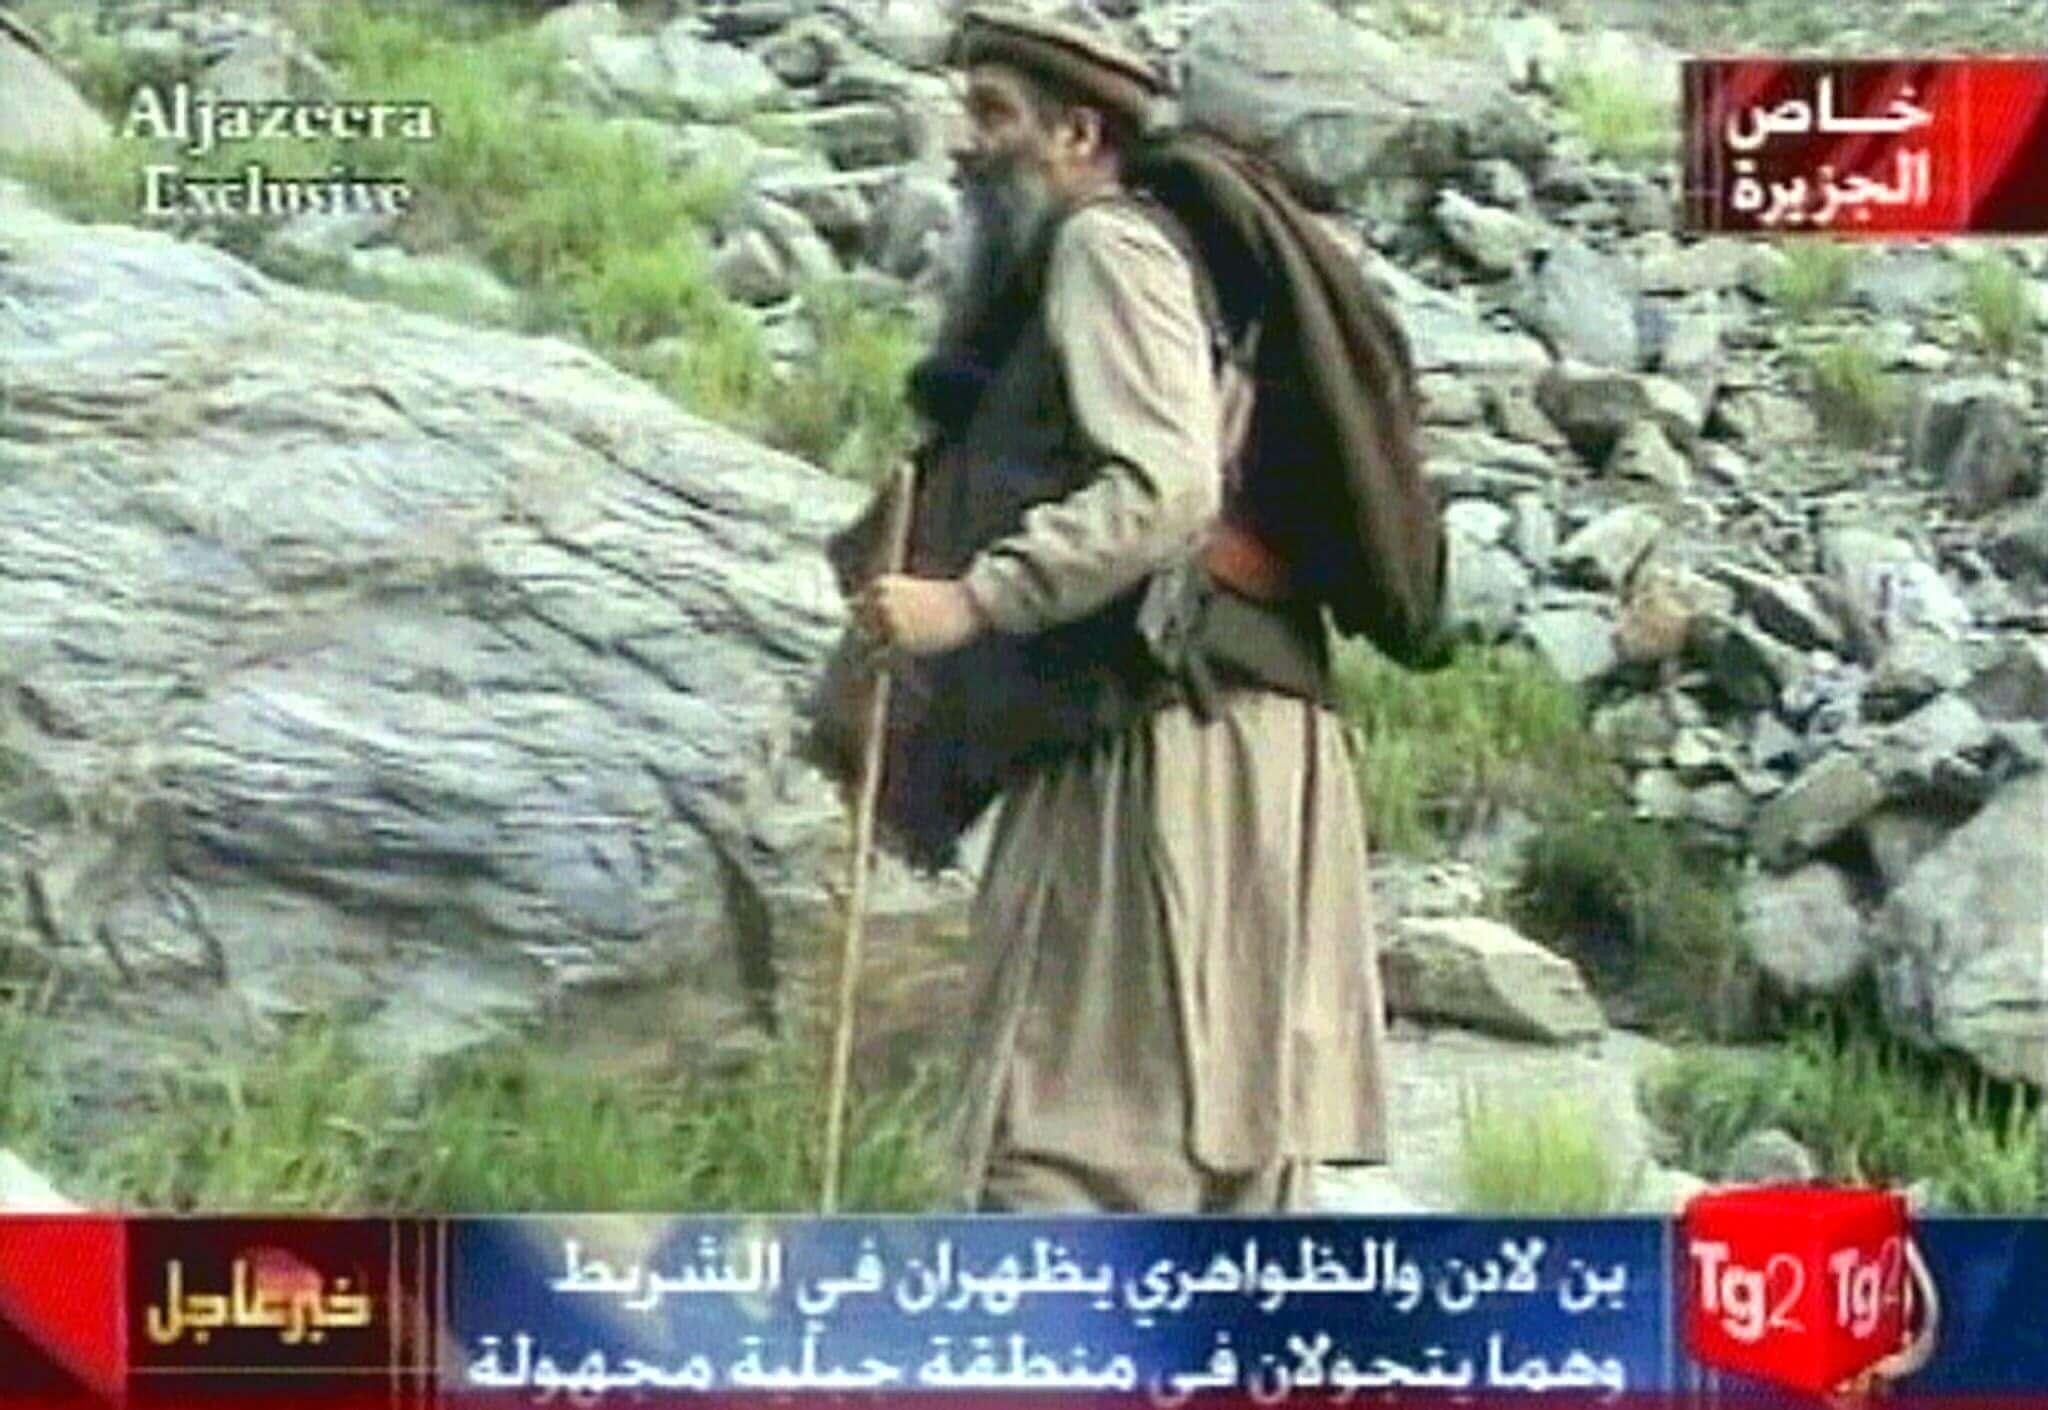 MISTERI/ Bin Laden è già morto nove volte, ma poi torna sempre in vita